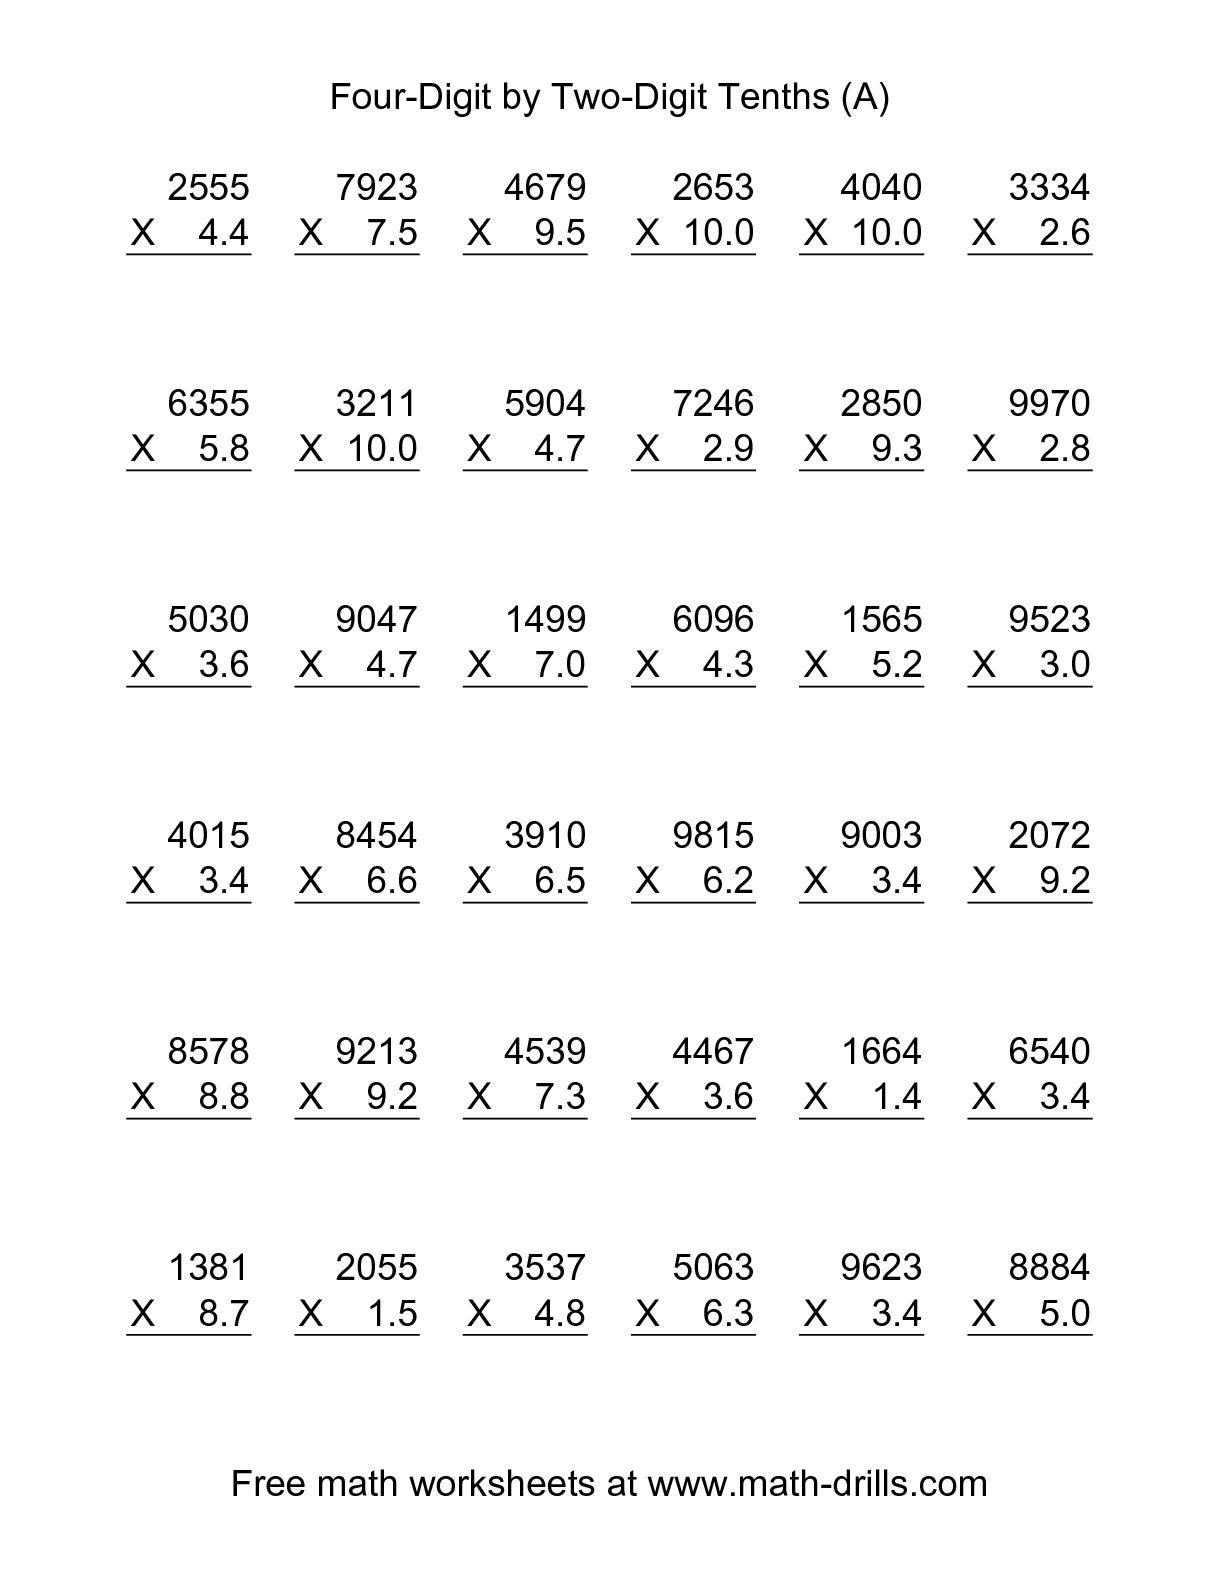 Decimal Multiplication And Division Worksheets Free Printables With - Multiplying Decimals Free Printable Worksheets